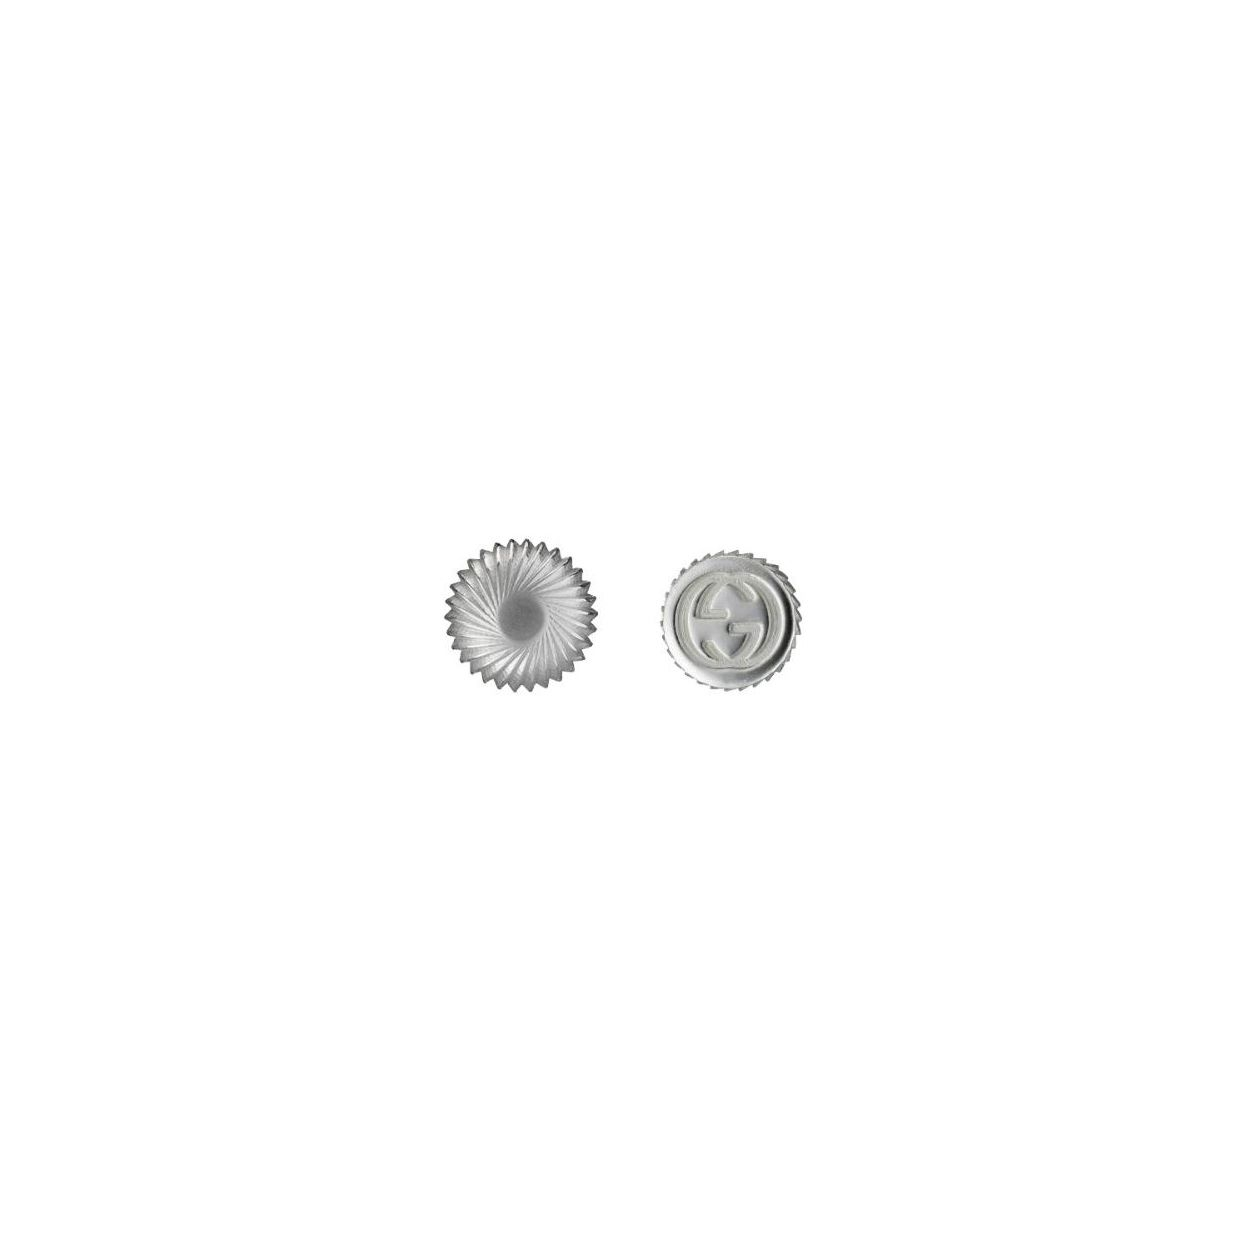 Orecchini asimmetrici con logo GG GUCCI earrings sconto discount